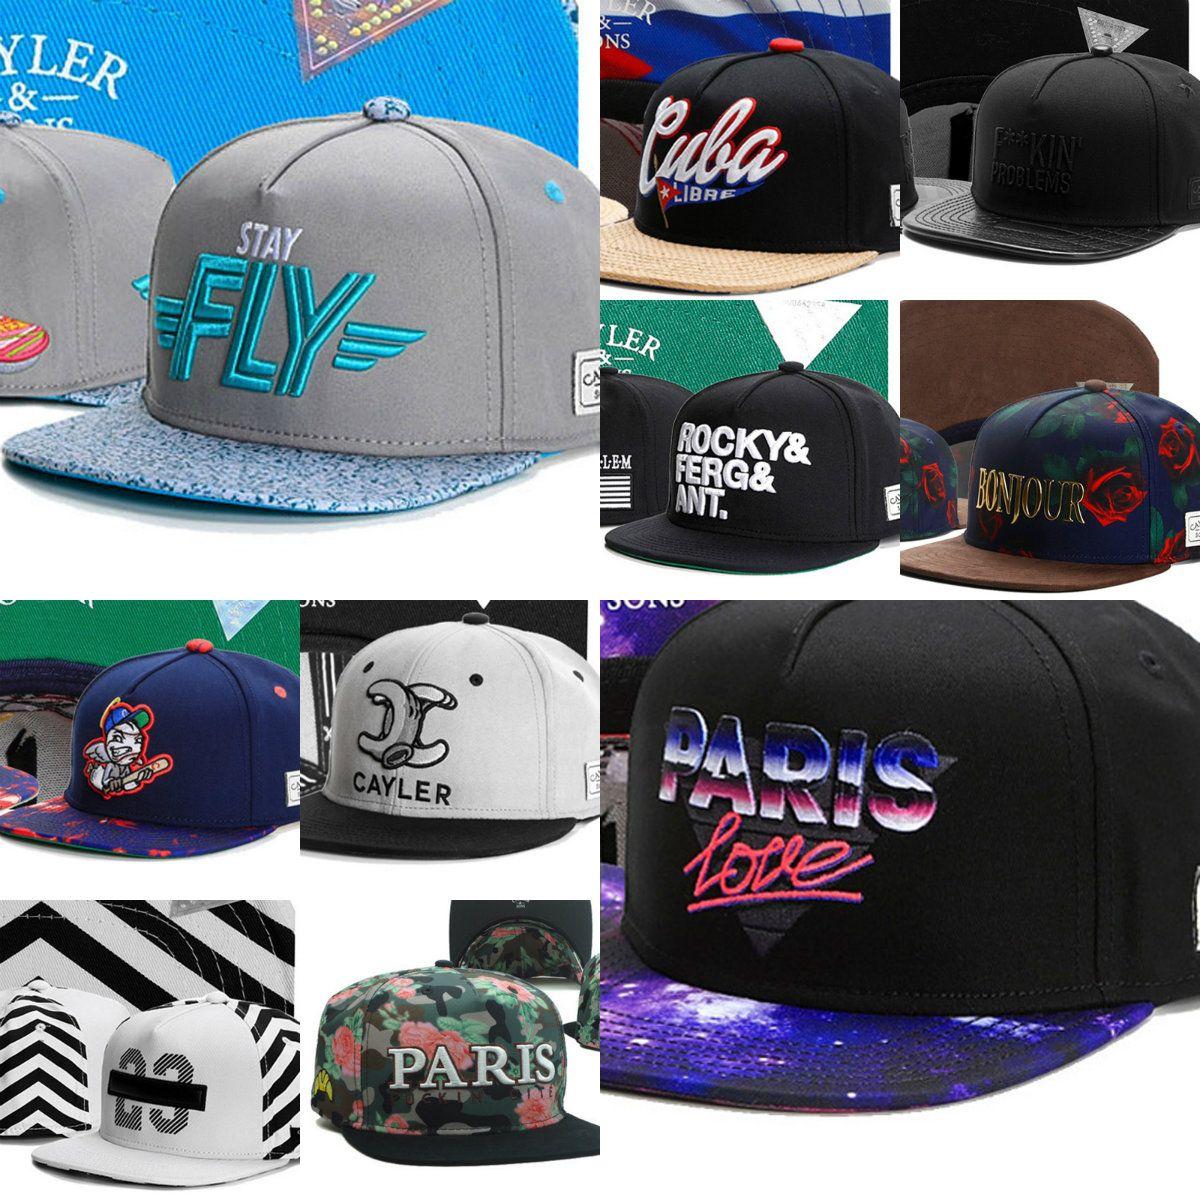 86892d319cc 22 Style Brand Designer Hat Fitted Baseball Caps Black Mens Women Luxury  Snapback Hats For Men Snapbacks Hip-hop Basketball Cap Cappelli Men Hats  Snapback ...